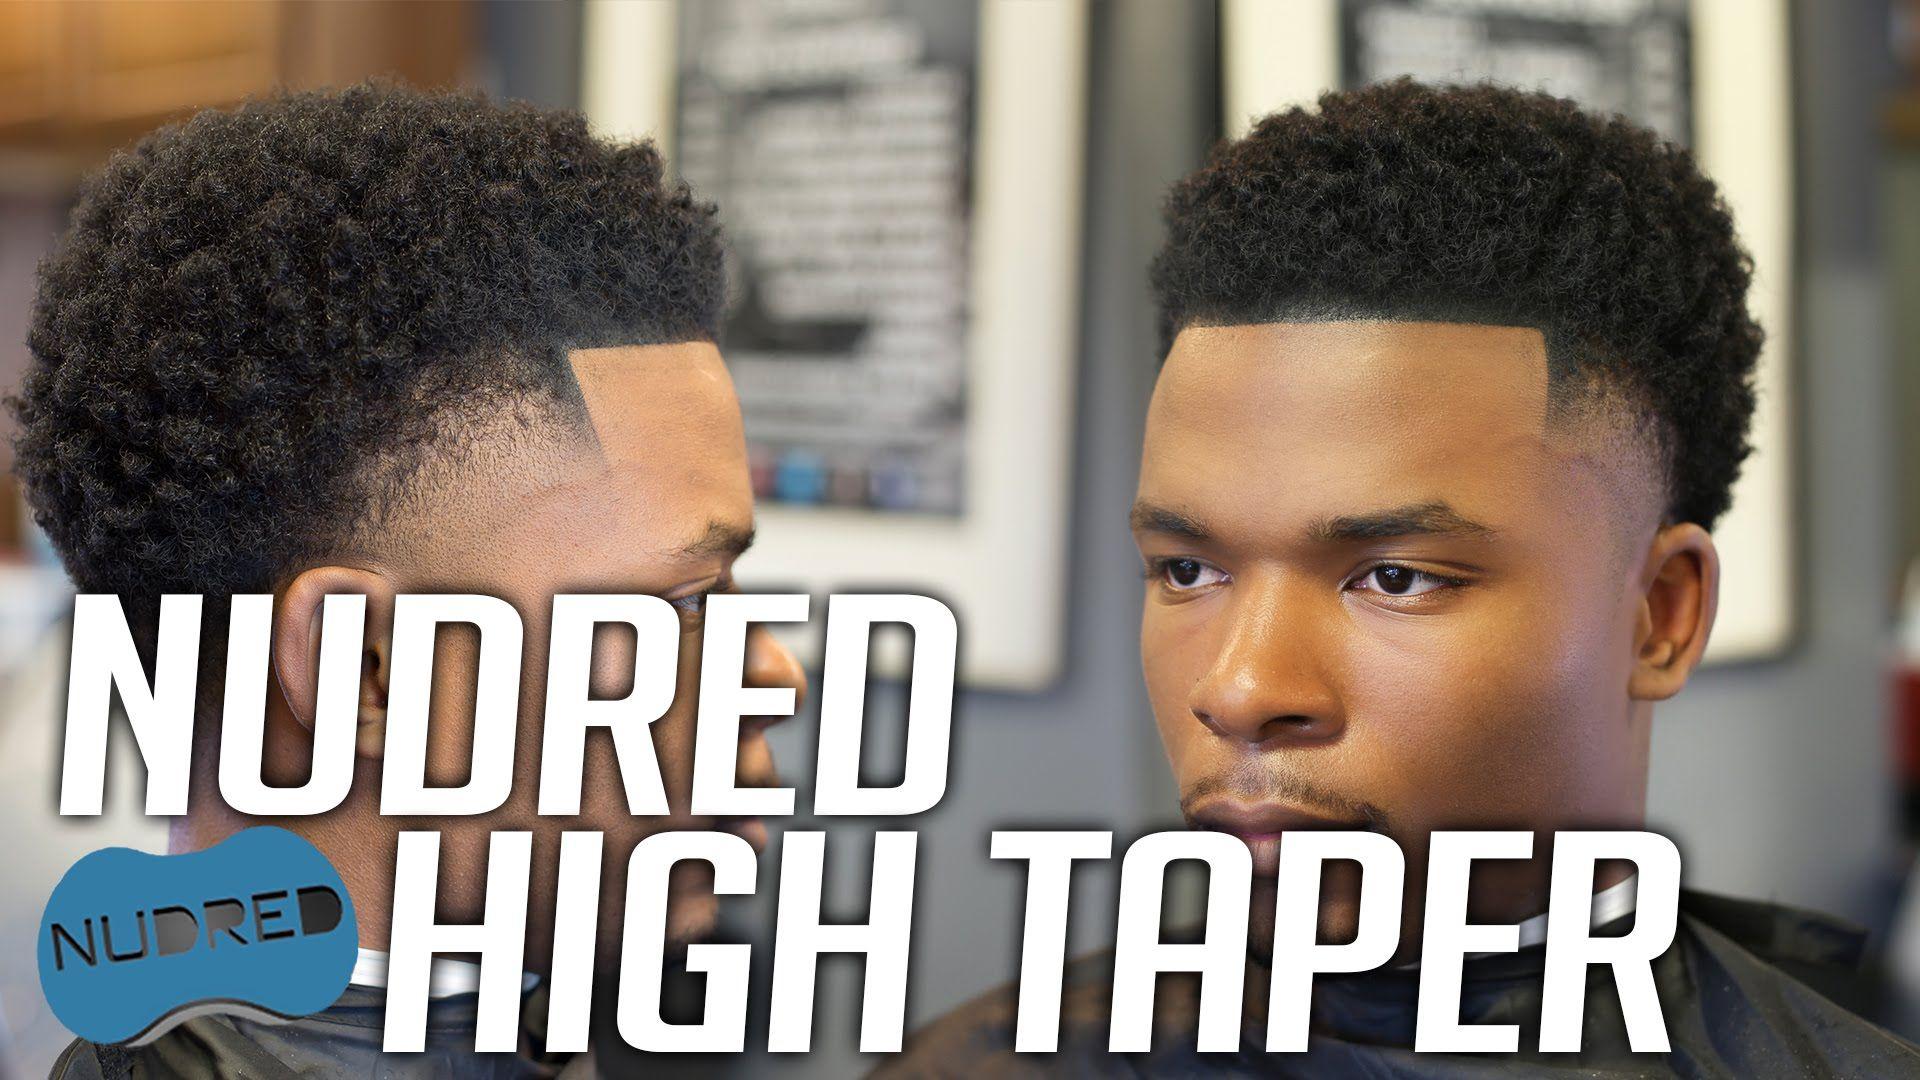 How To Duke Starting 5 Nudred High Taper Fade Men S Haircut Tutorial Hd 1080p 60fps High Taper Fade Haircuts For Men Mens Haircuts Fade